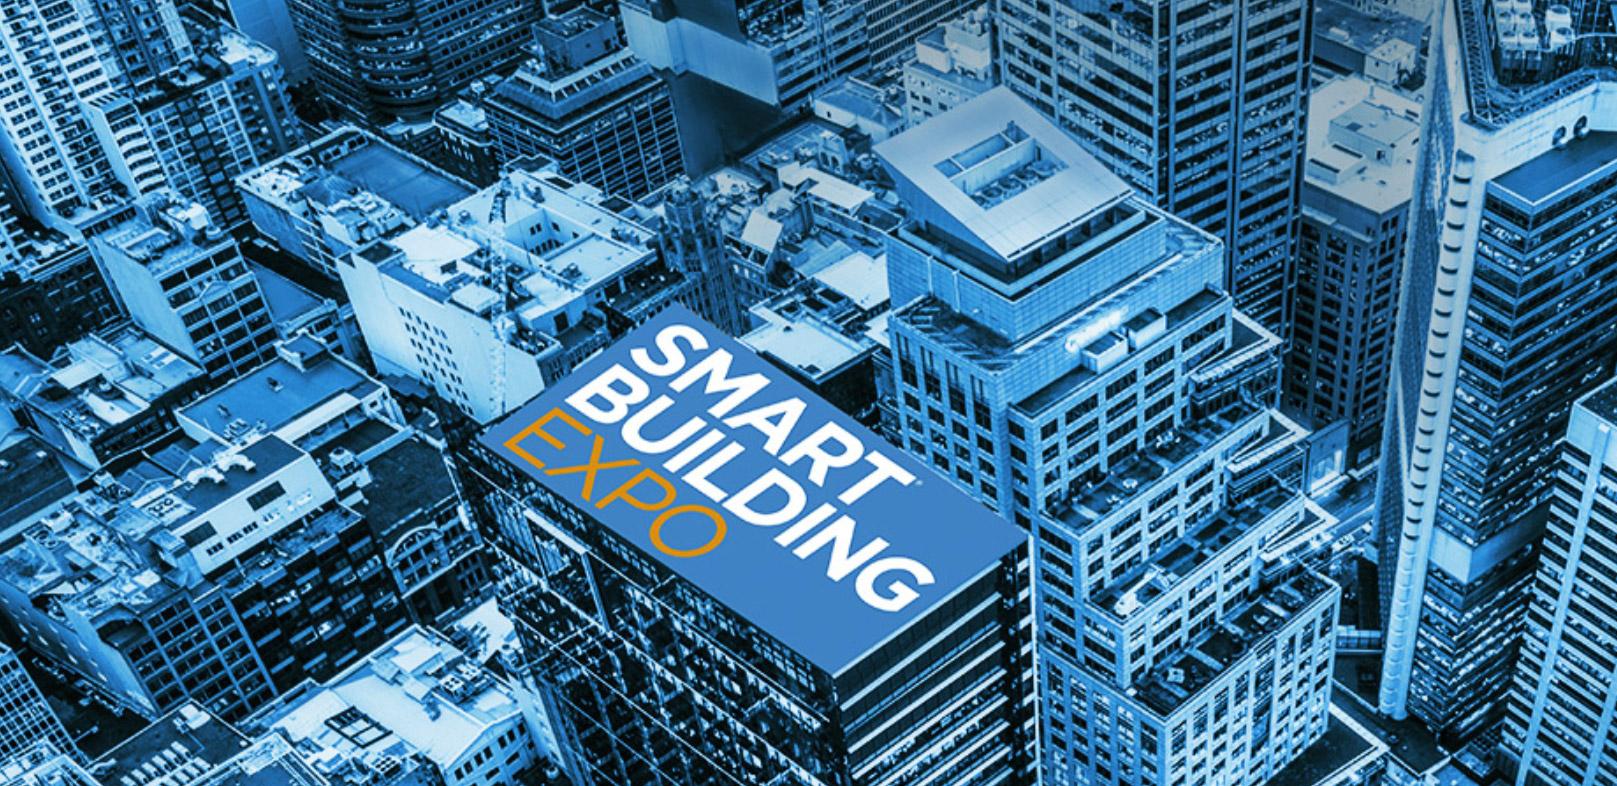 Smart building Expo 2019